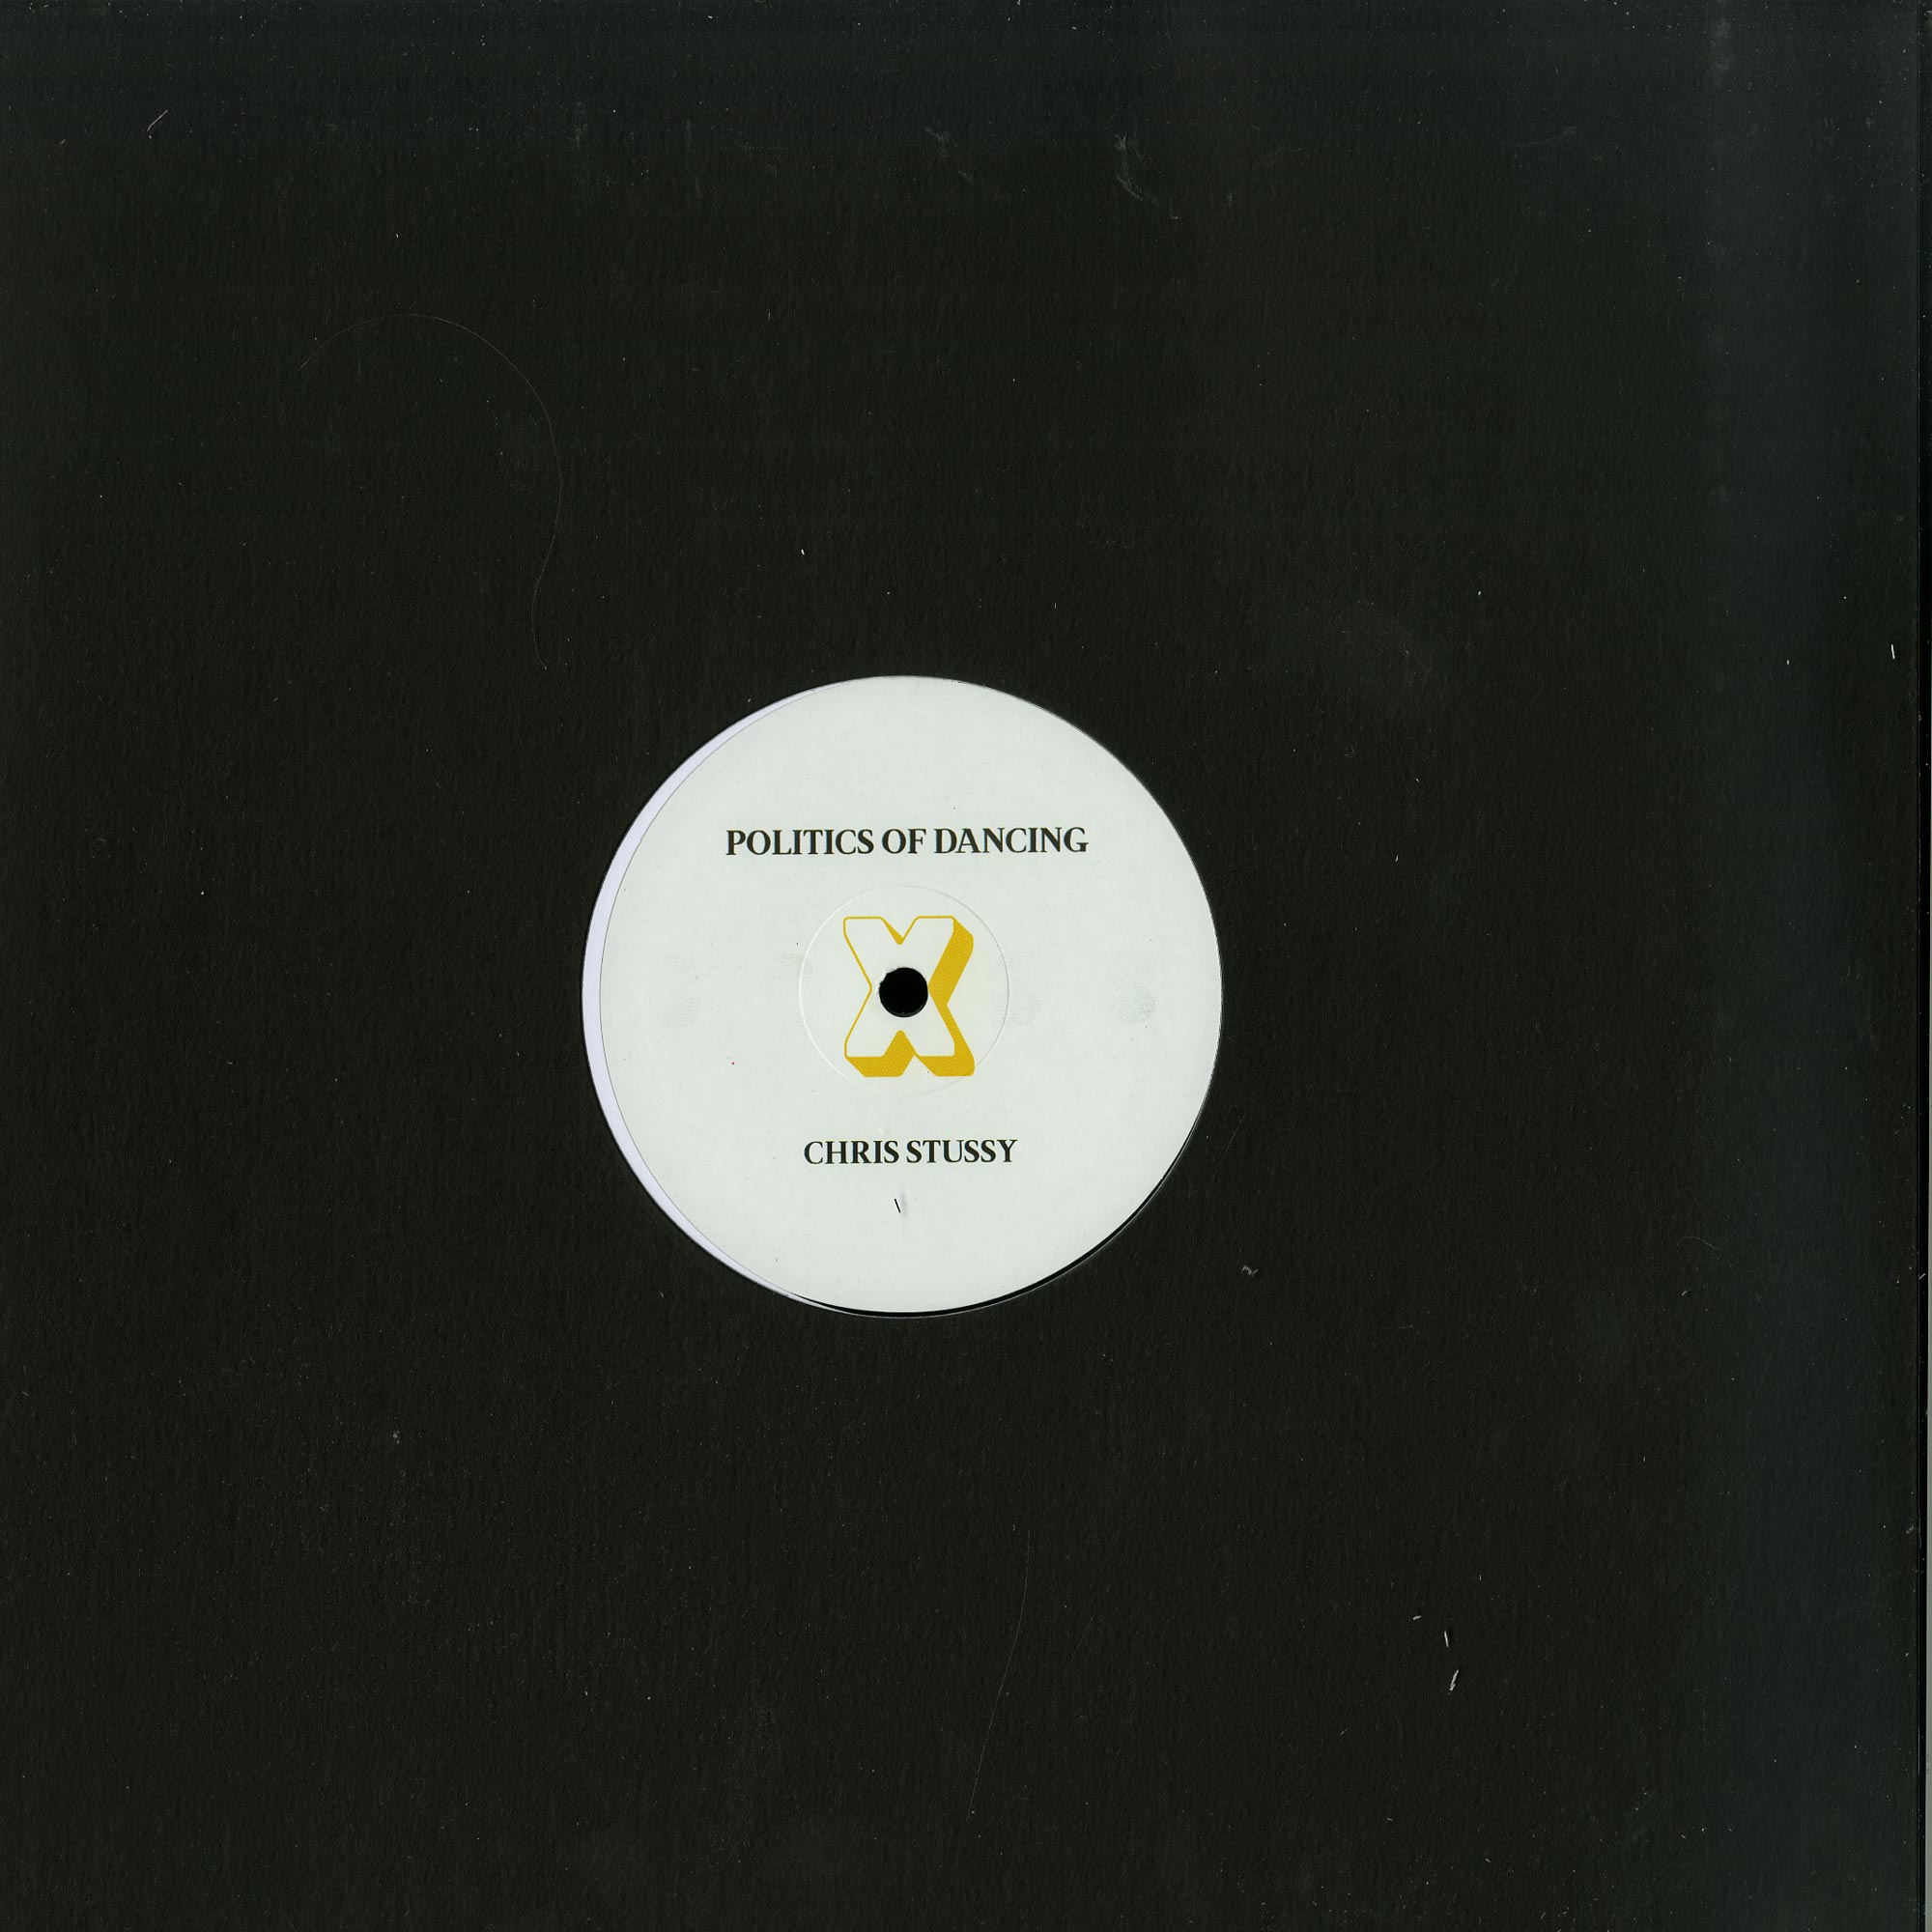 Politics Of Dancing / Chris Stussy / Sun Archive - POLITICS OF DANCING X CHRIS STUSSY & SUN ARCHIVE